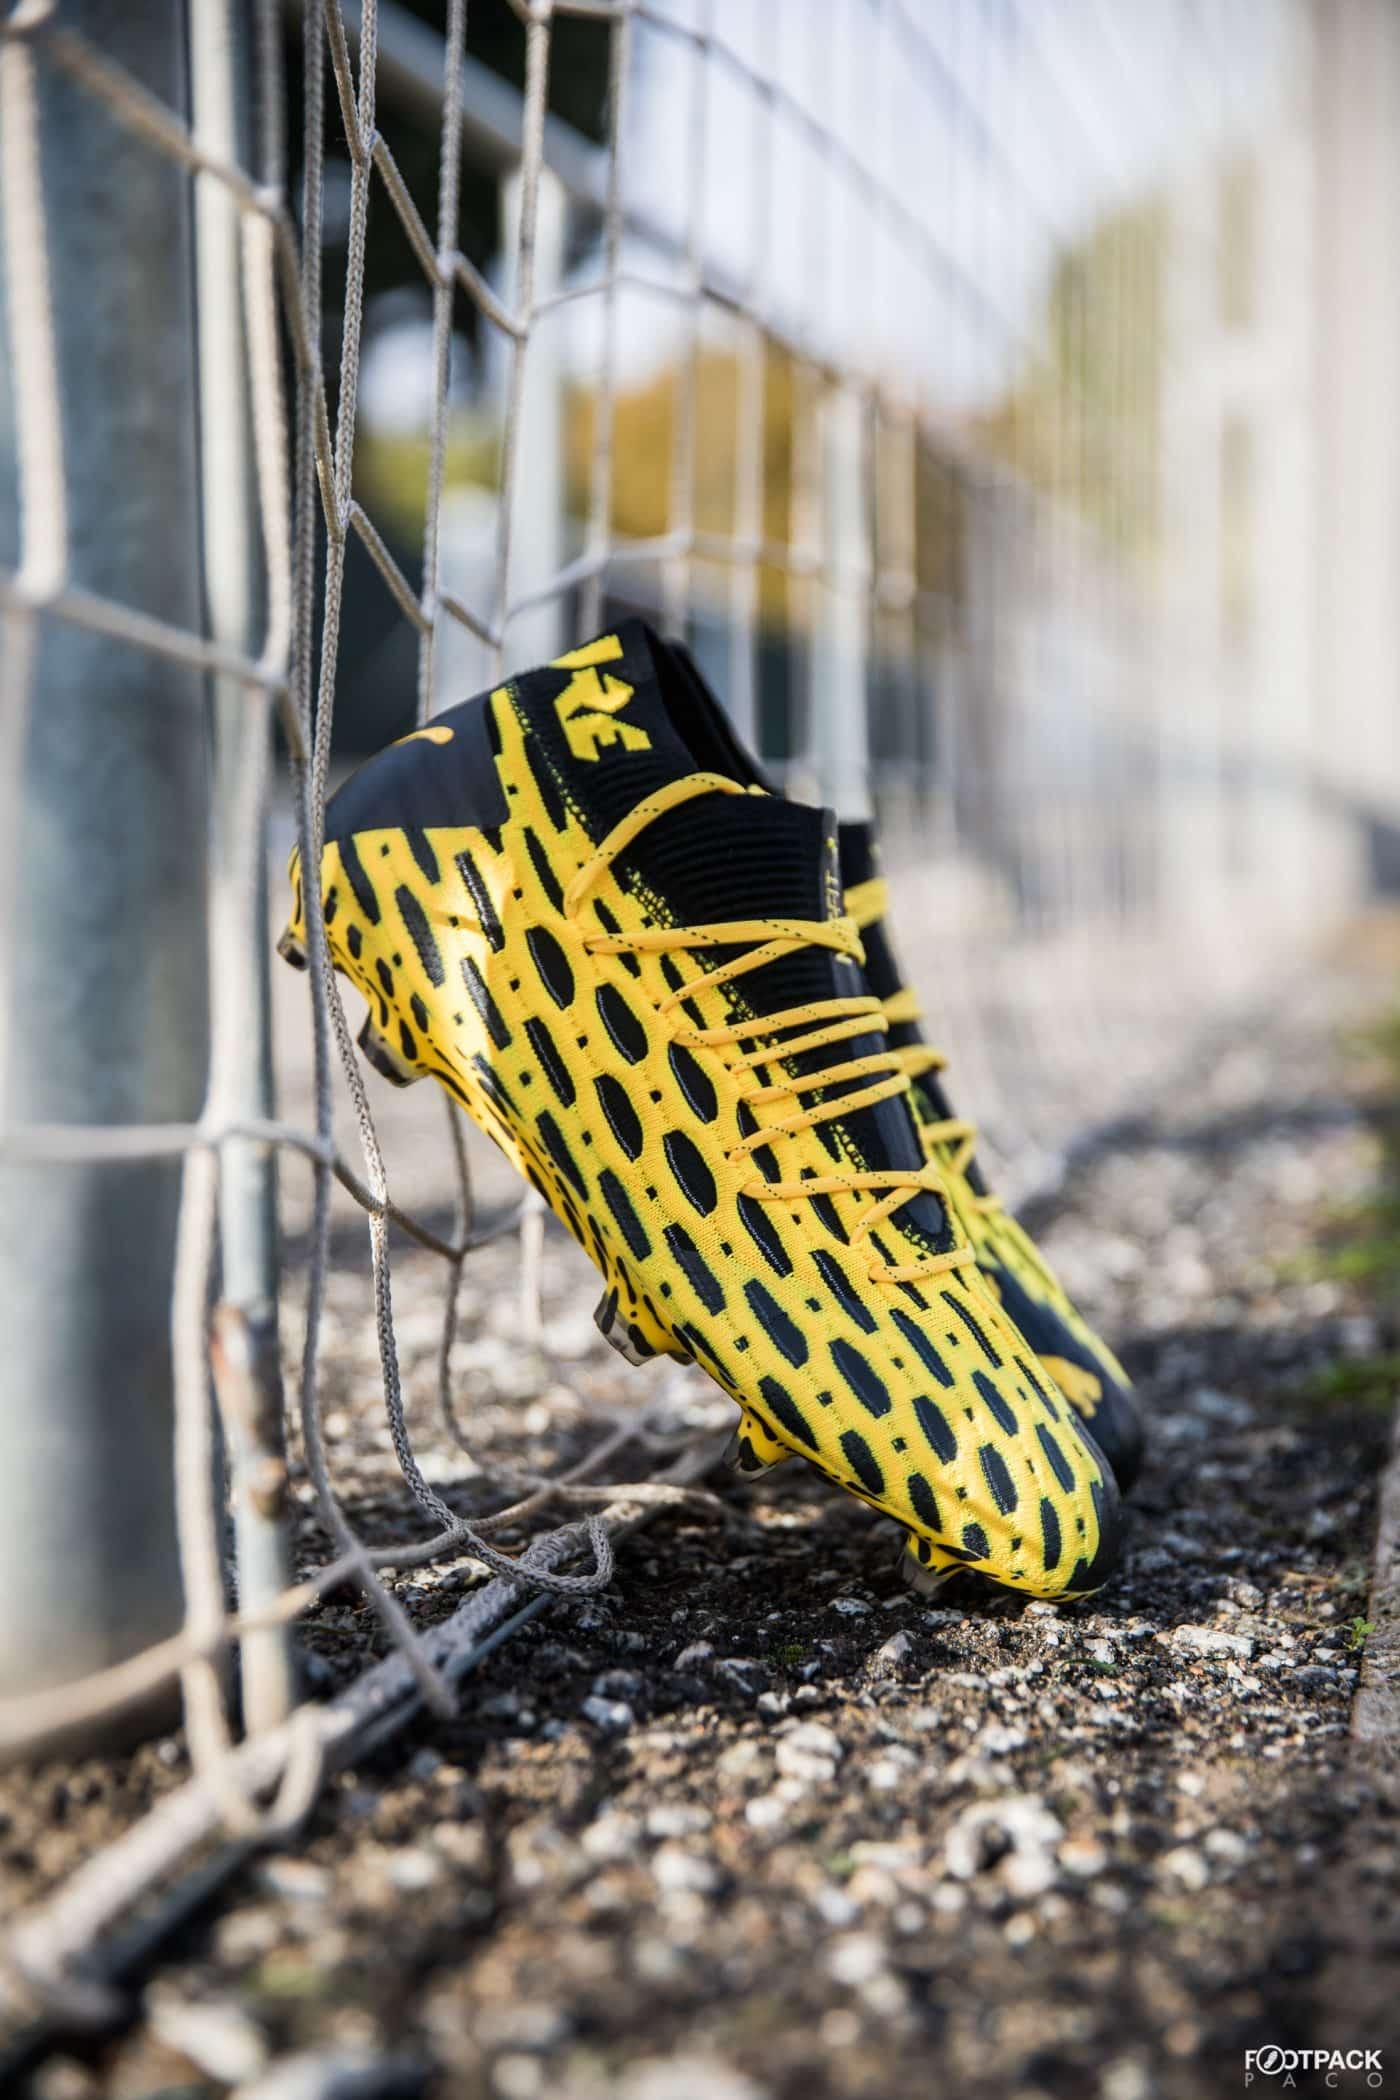 chaussures-de-foot-puma-future-5.1-spark-janvier-2020-footpack-8